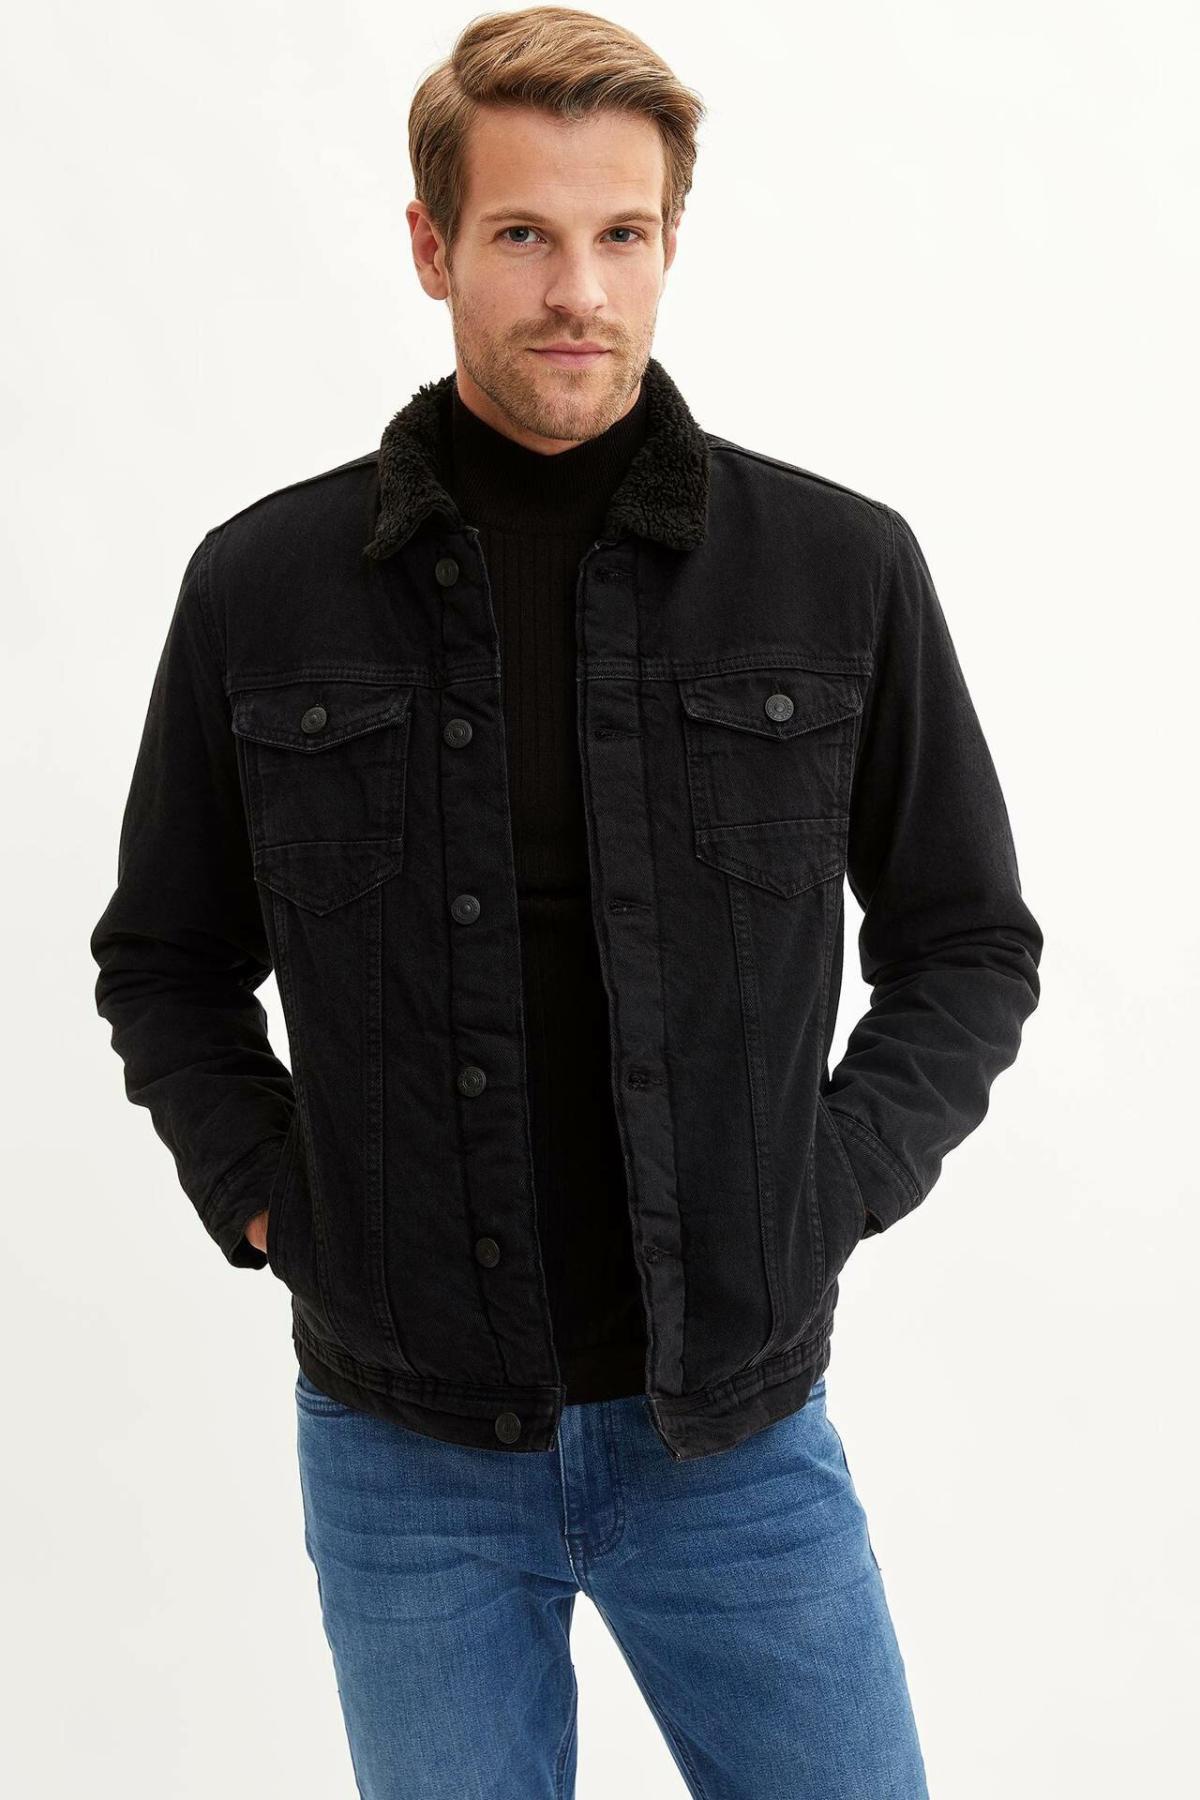 DeFacto Man Black Lapel Denim Joker Short Jacket Casual Pocket Streetwear Fashion Tide Slim Denim Jacket -L5570AZ19WN